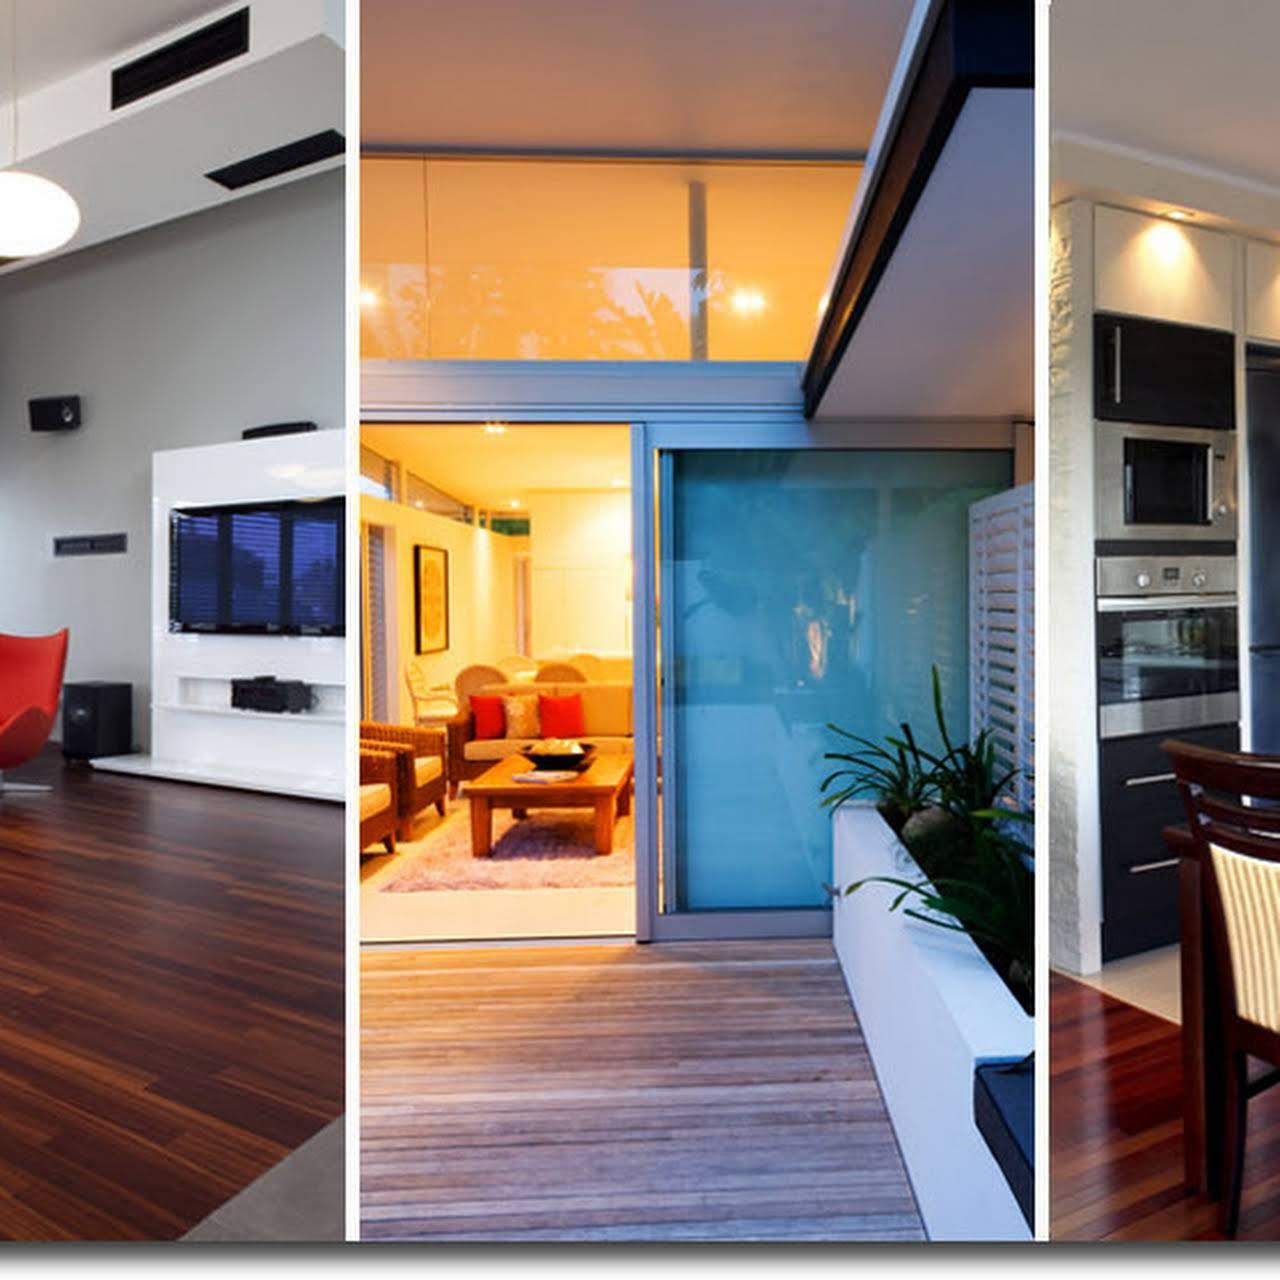 DESAINER INTERIOR RUMAH Desain Interior Rumah Jasa Desain